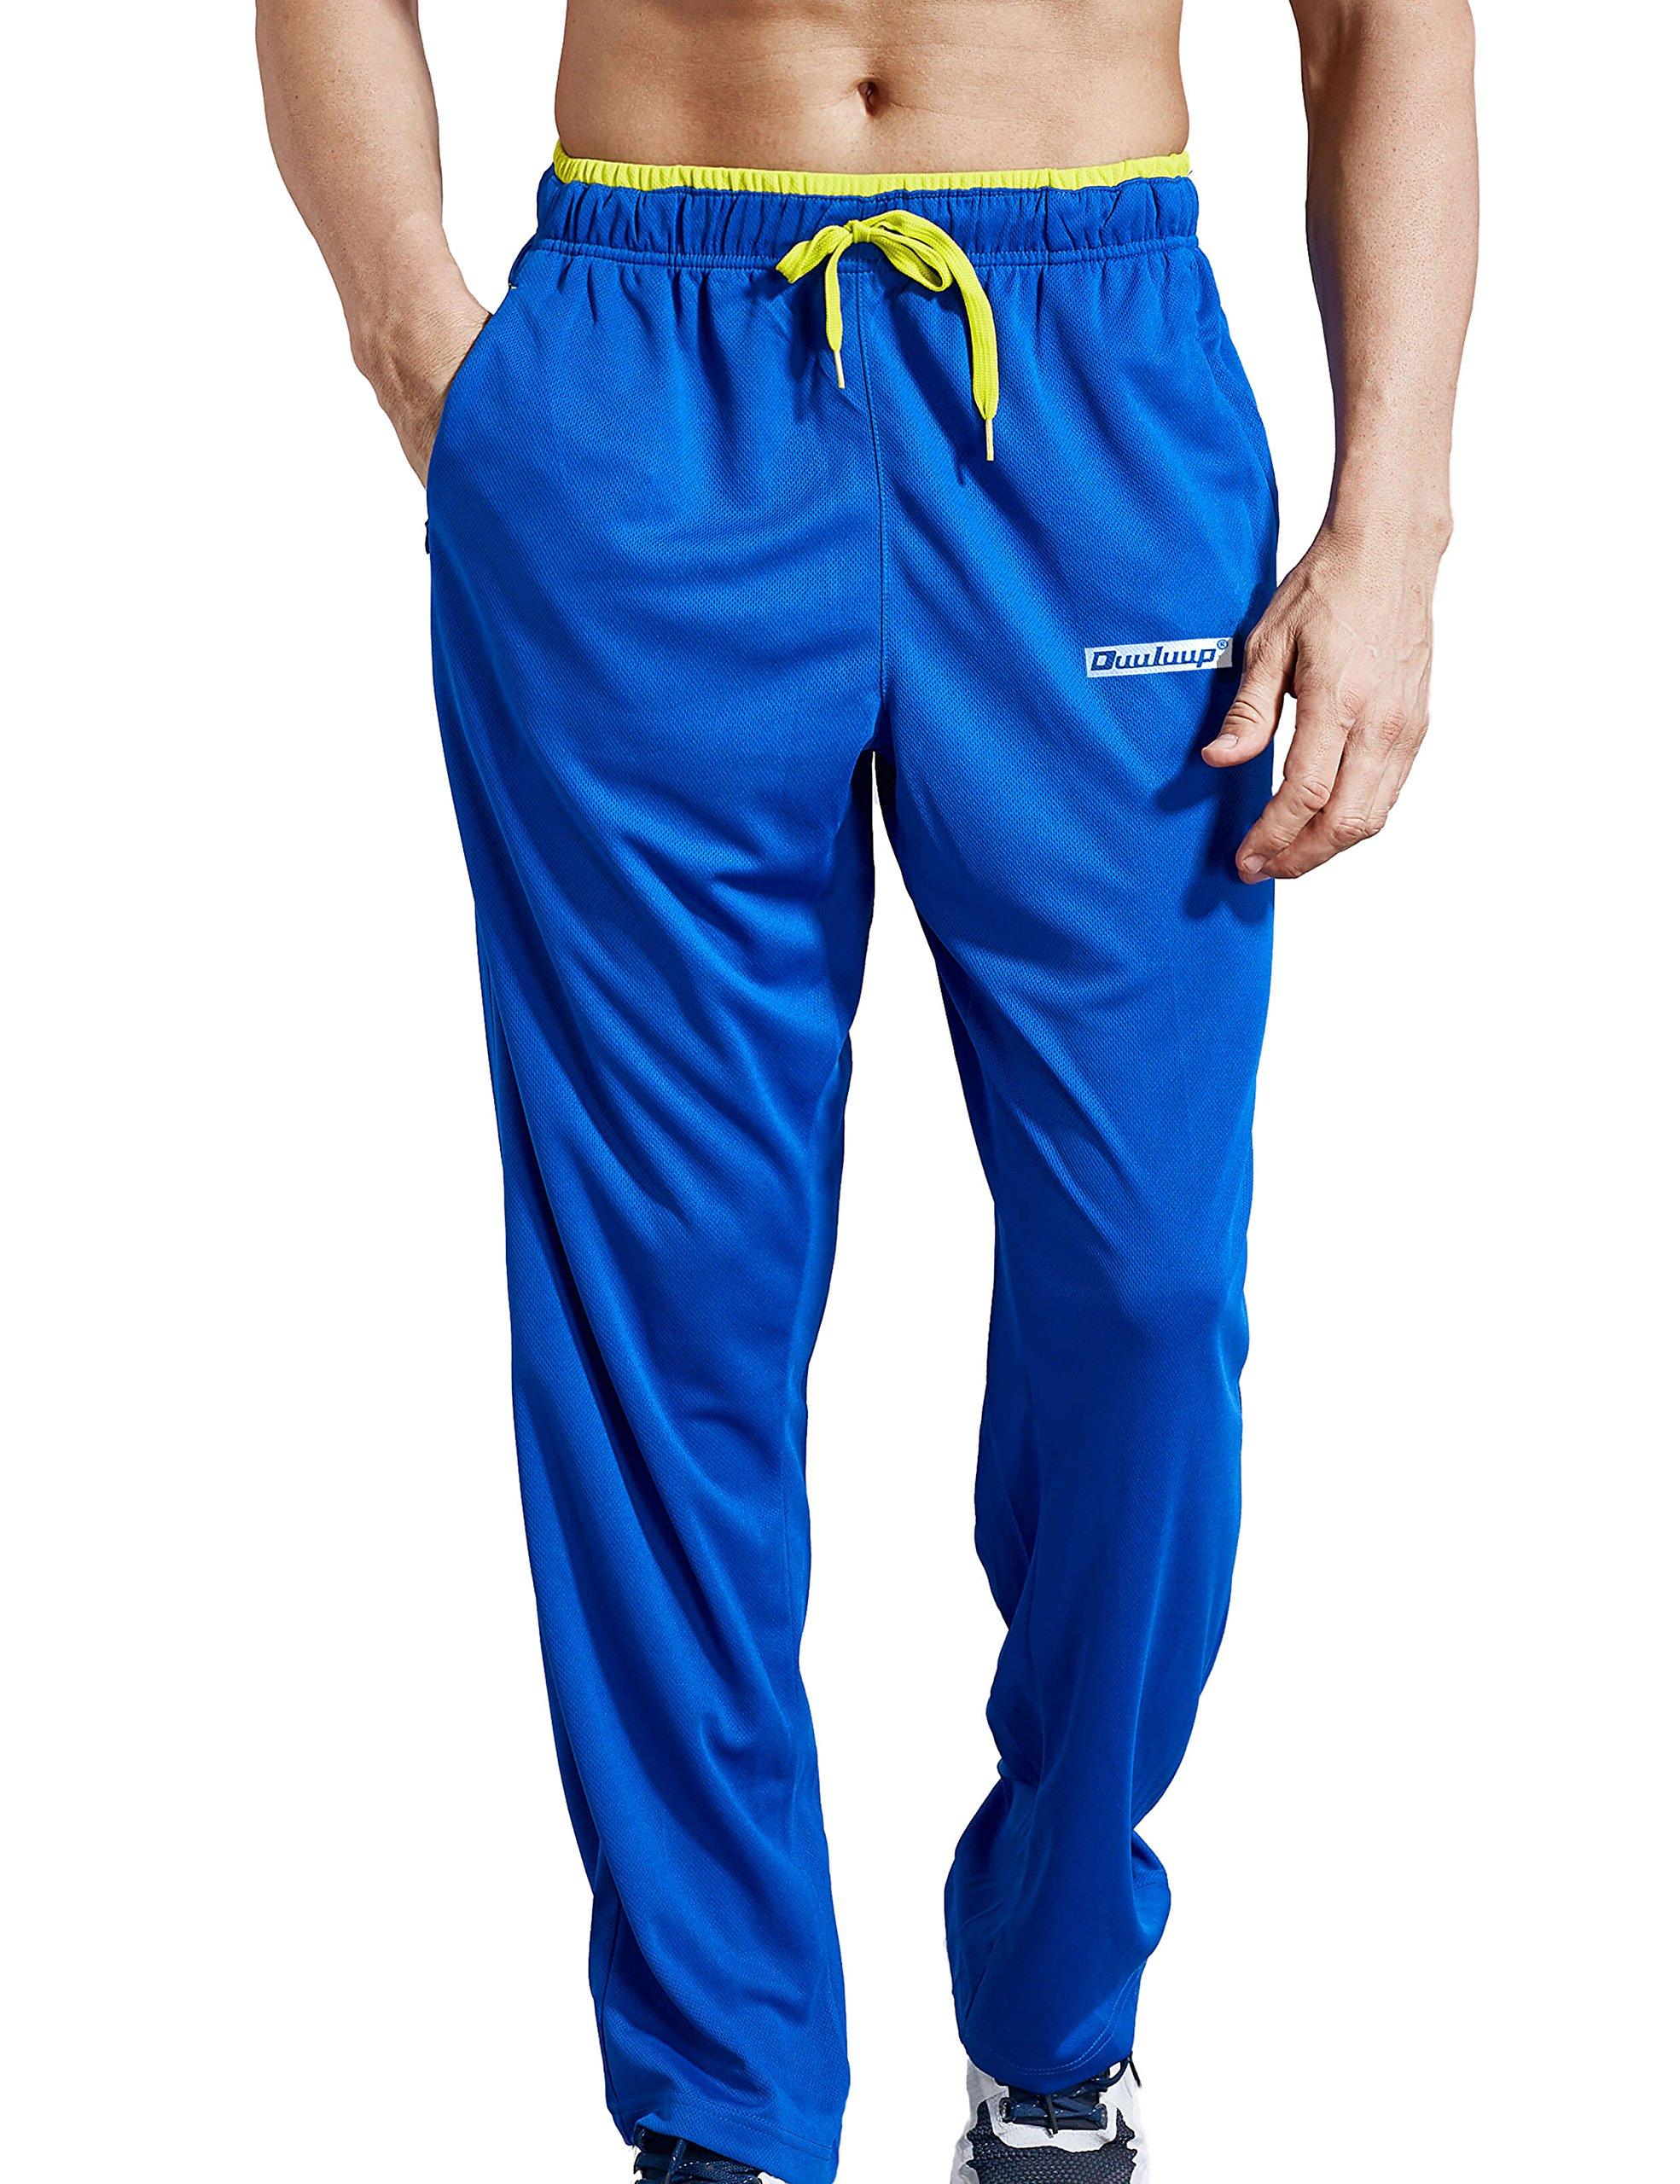 Duuluup Men Sport Pants - Quick Dry Active Sports Sweatpants Color Mixing with Zipper Pockets(Blue,XL)